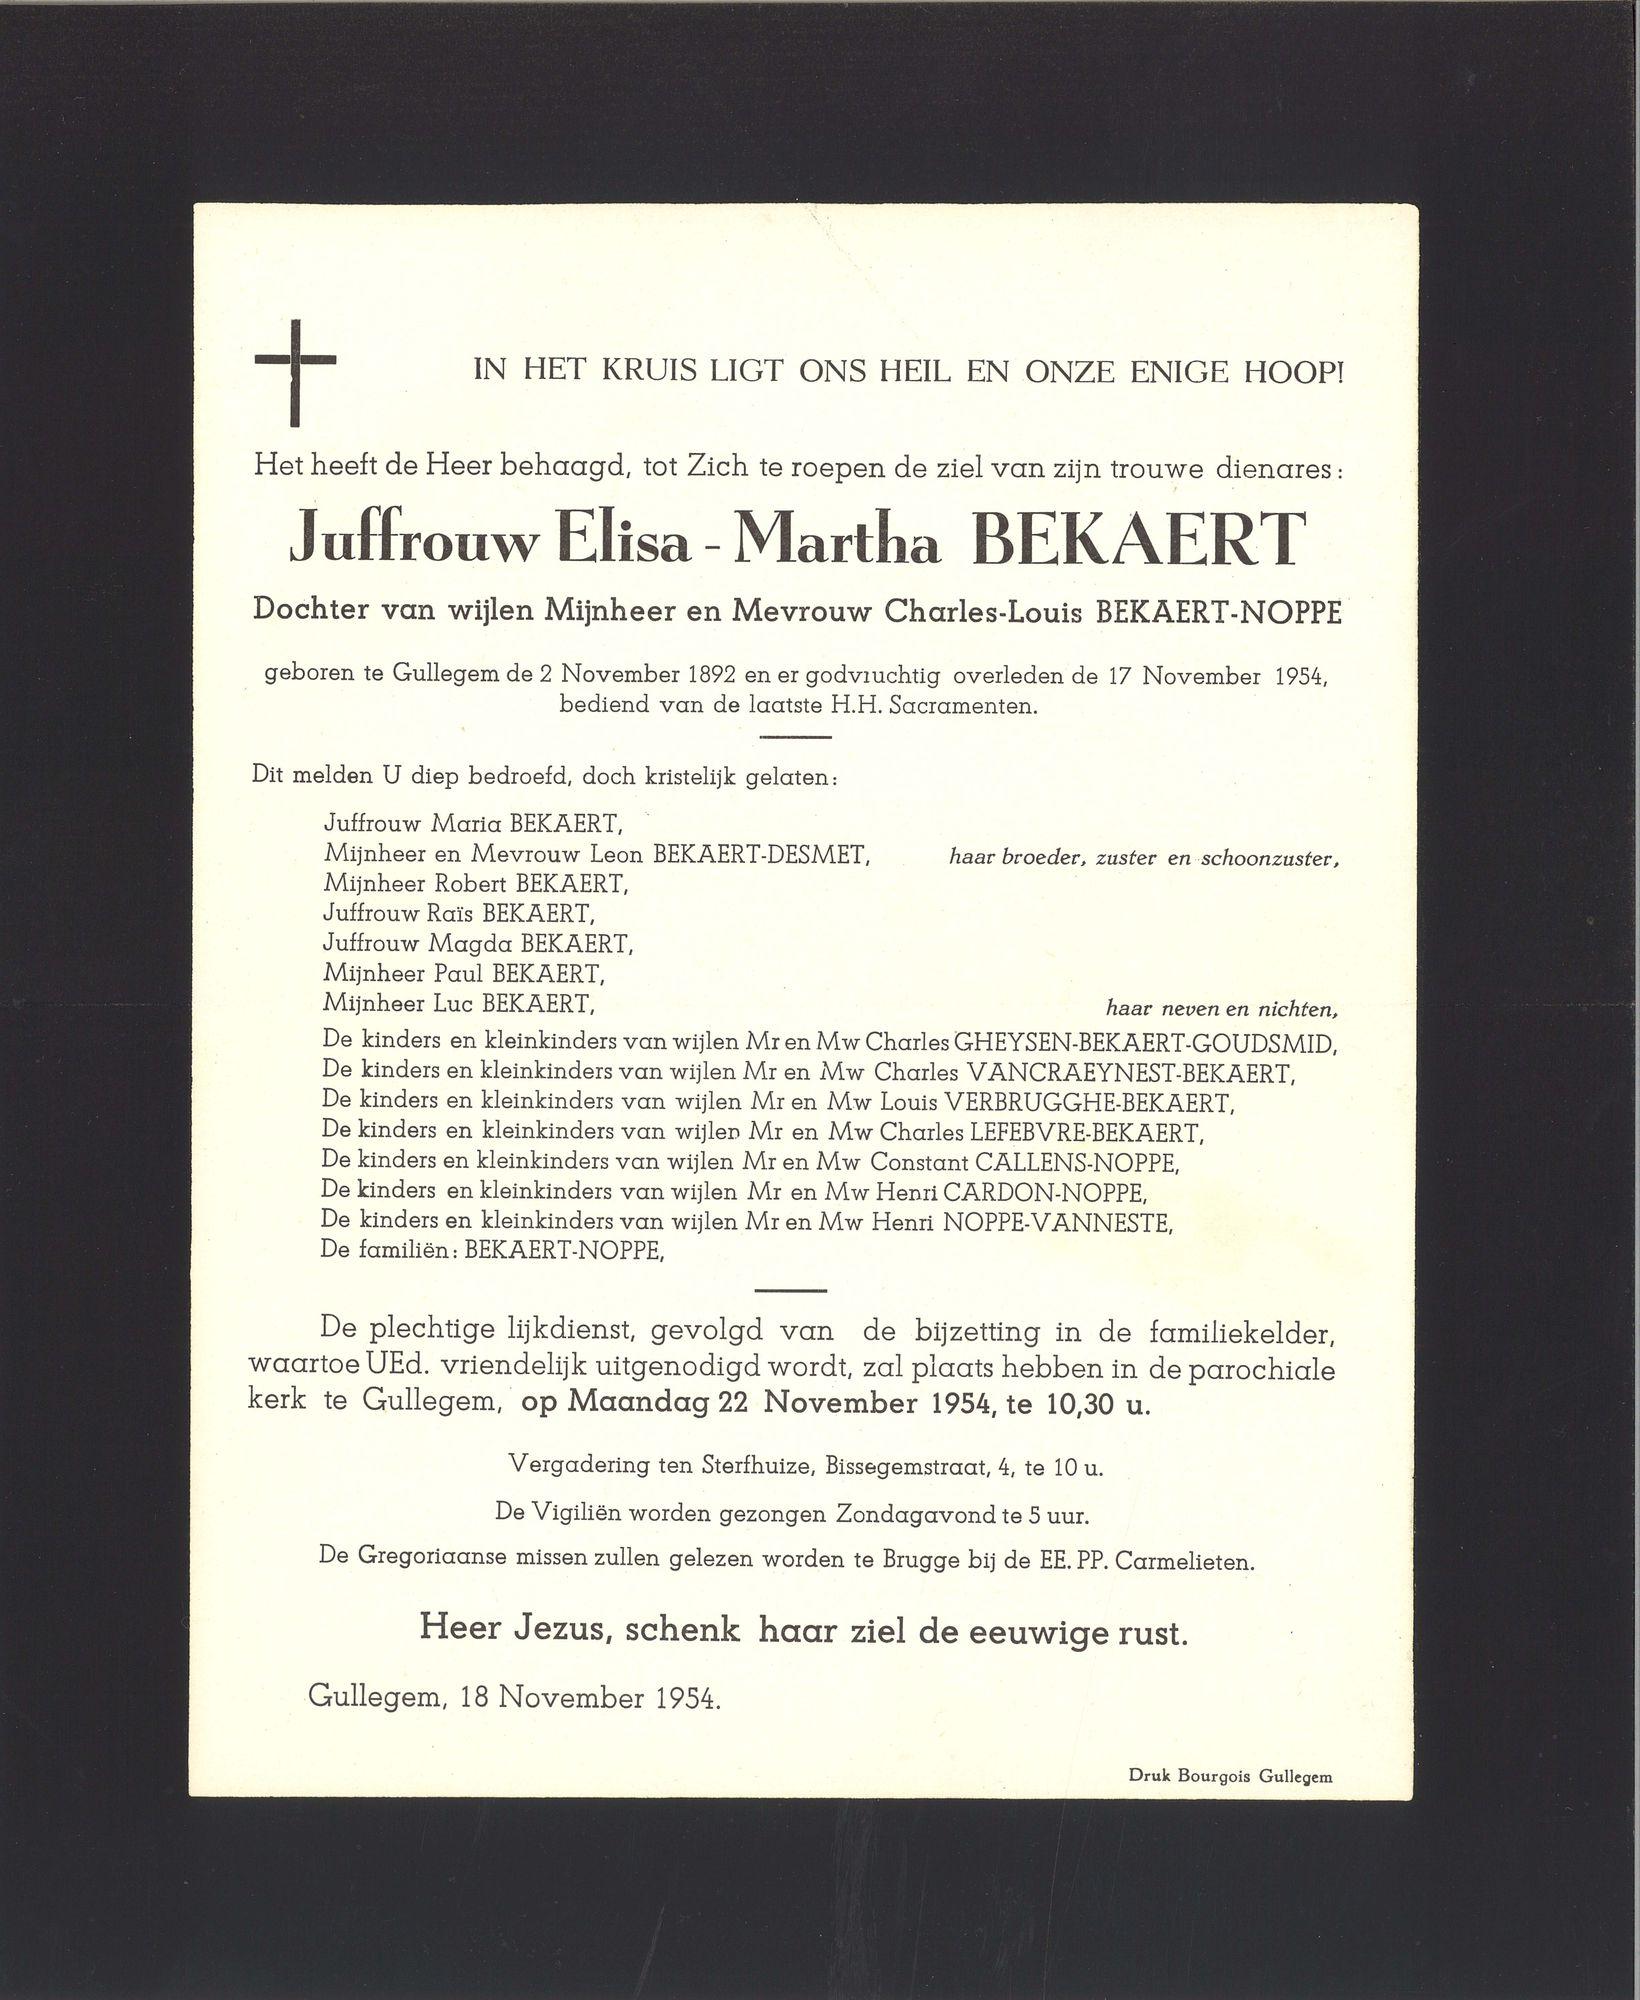 Elisa-Martha Bekaert